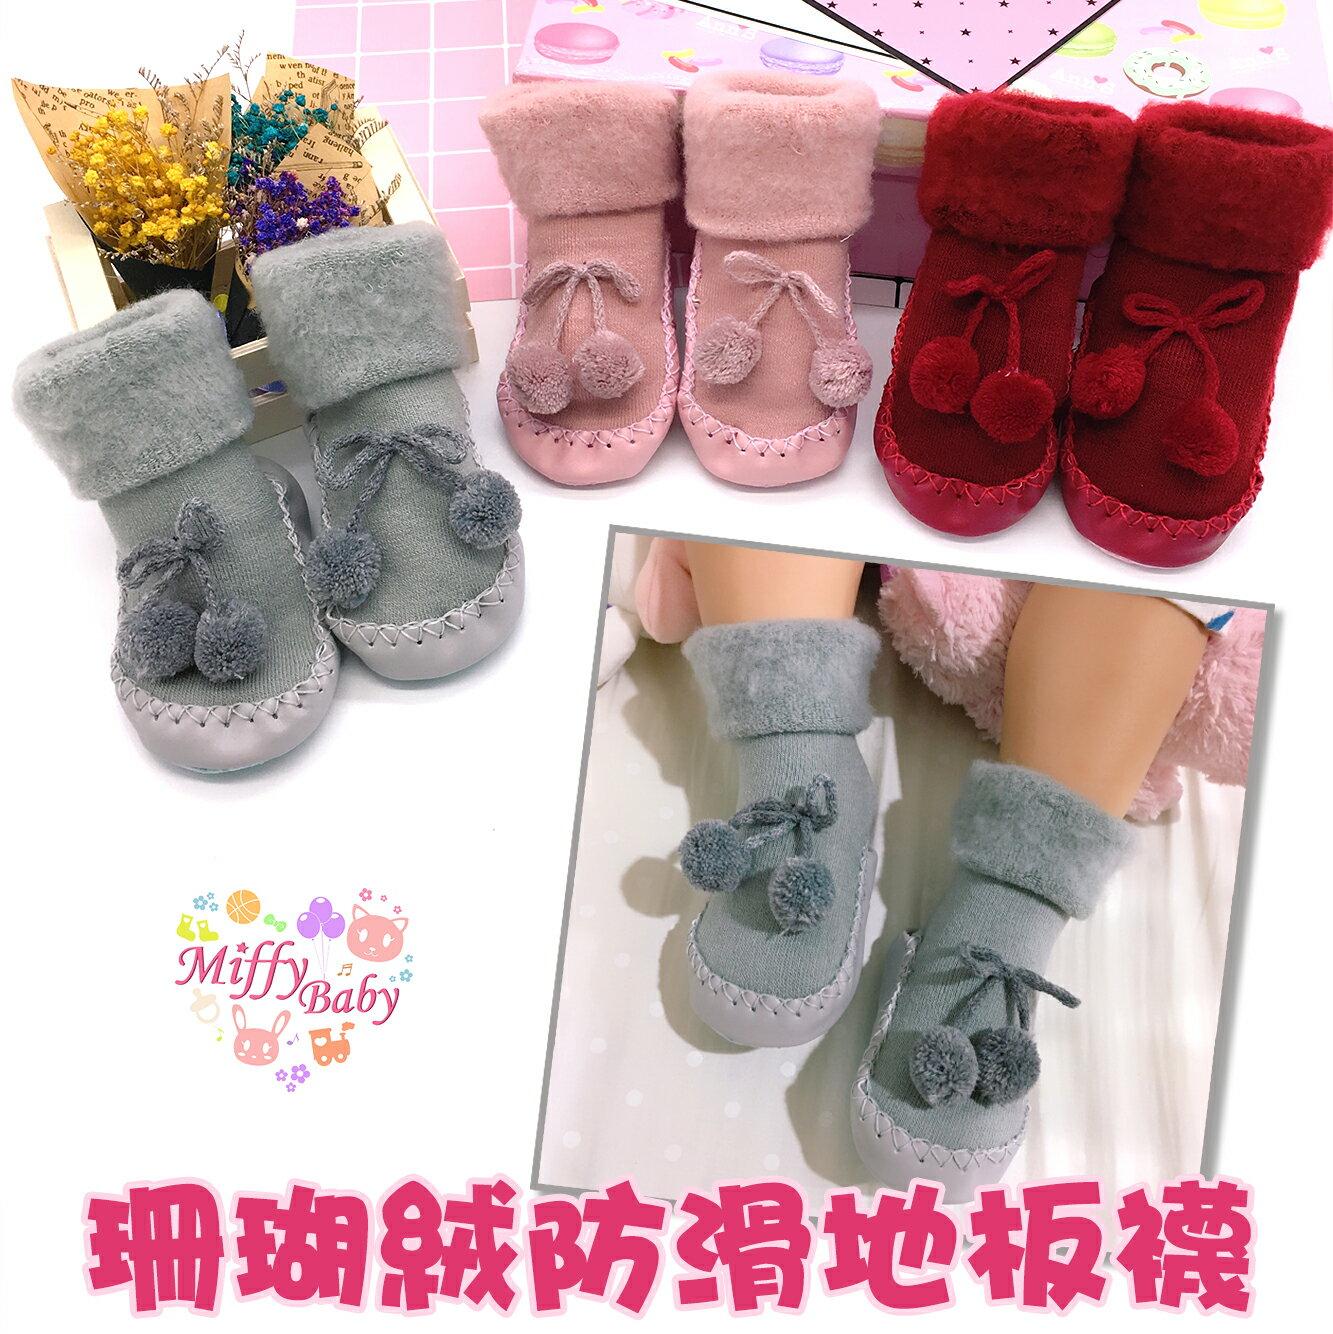 ❄️寒流來襲當日出貨❄️珊瑚絨寶寶防滑地板襪 防滑底襪套 嬰兒鞋 軟底學步鞋 室內鞋 兒童襪-miffybaby